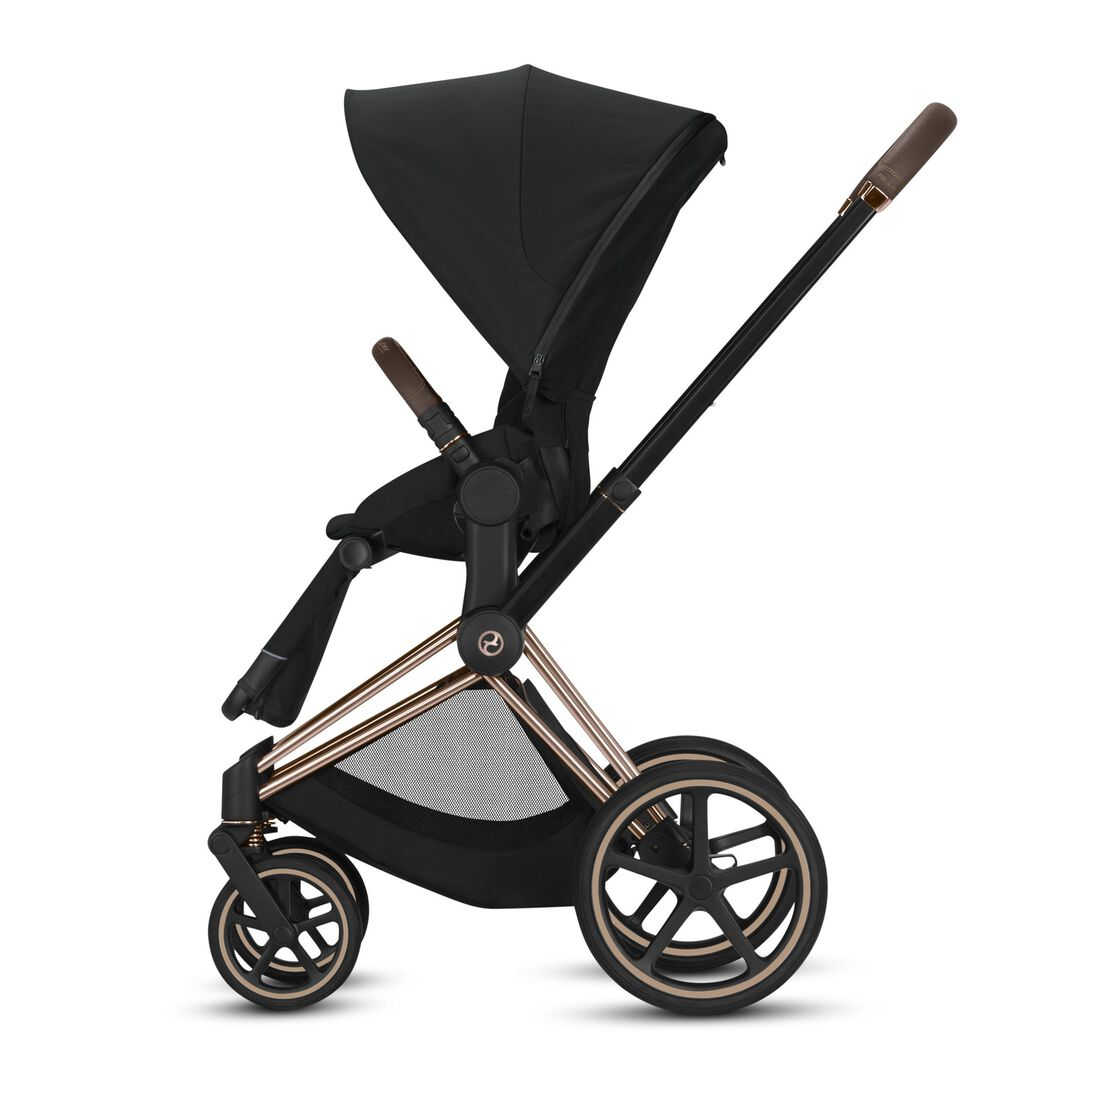 CYBEX Balios S 2-in-1 Pushchair - Spacious shopping basket